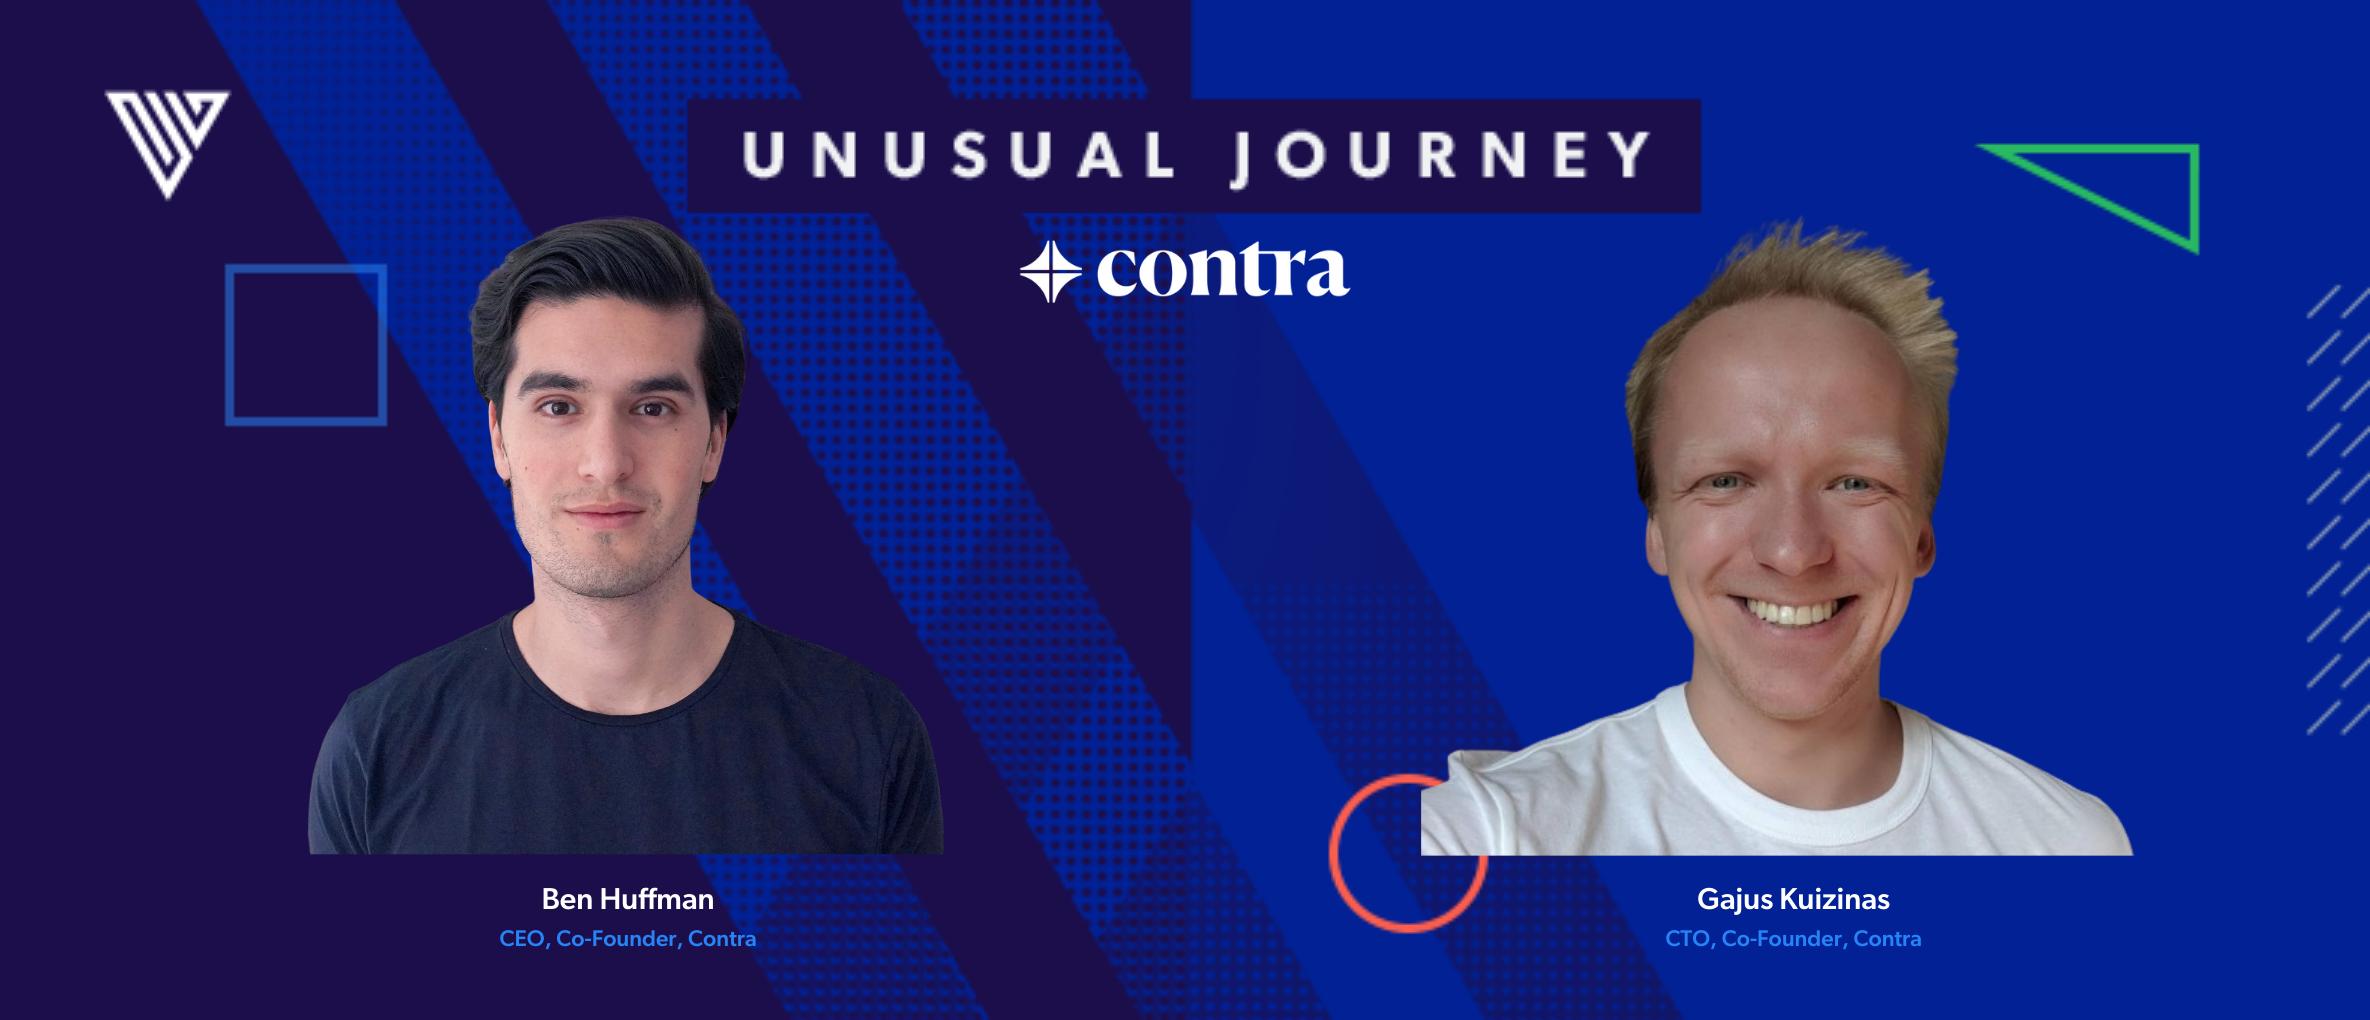 Contra's Unusual Journey